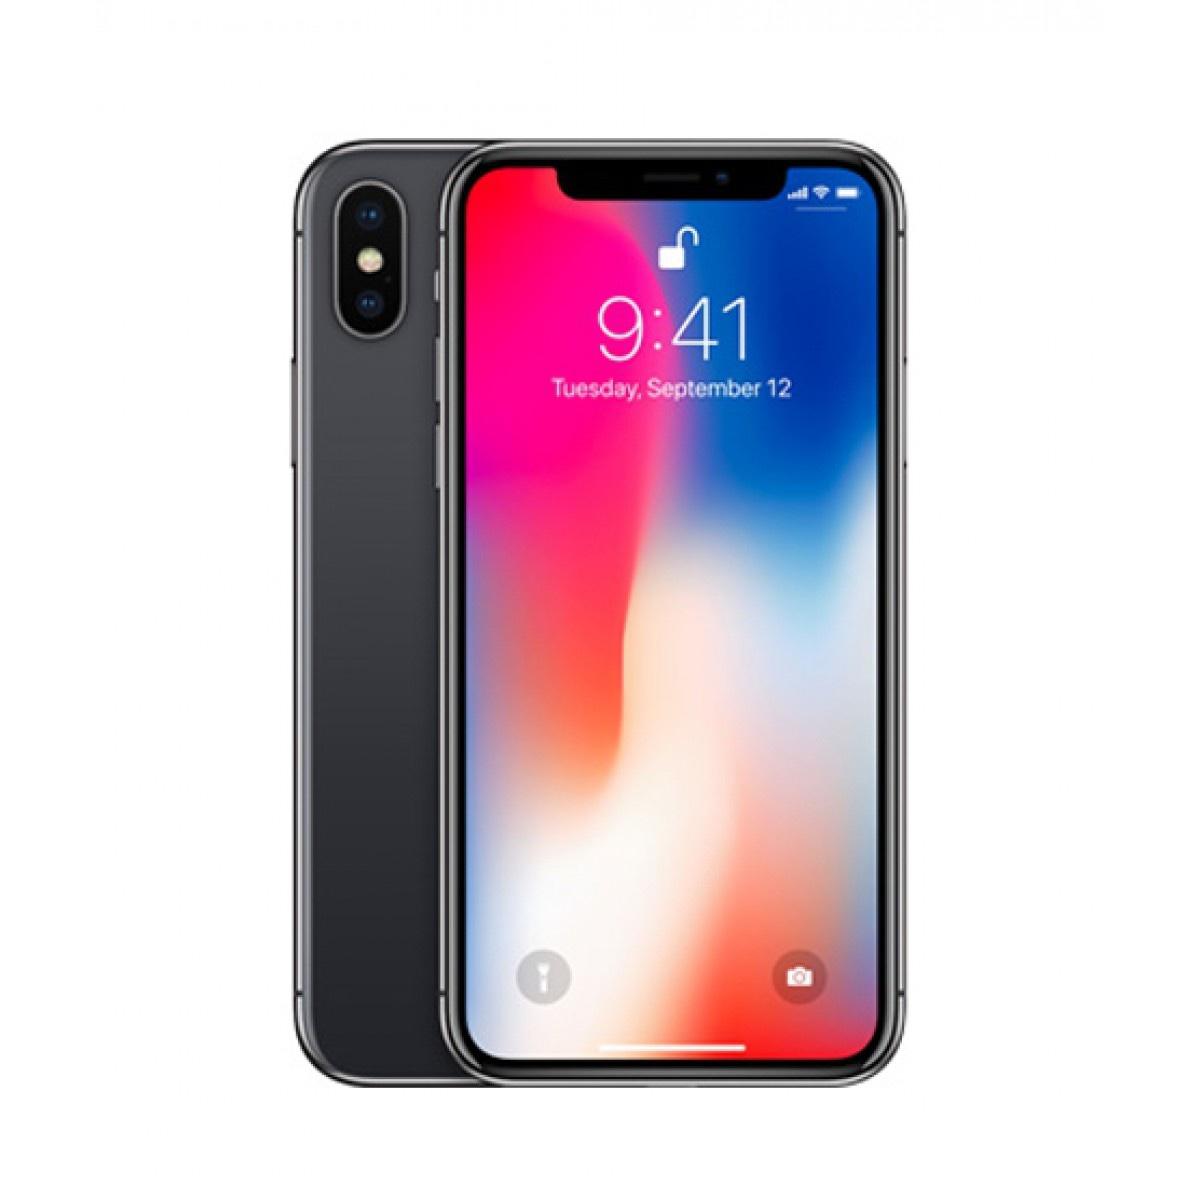 iPhone X 64GB Dijual Pada Harga RM3,599.00 - ifon.my